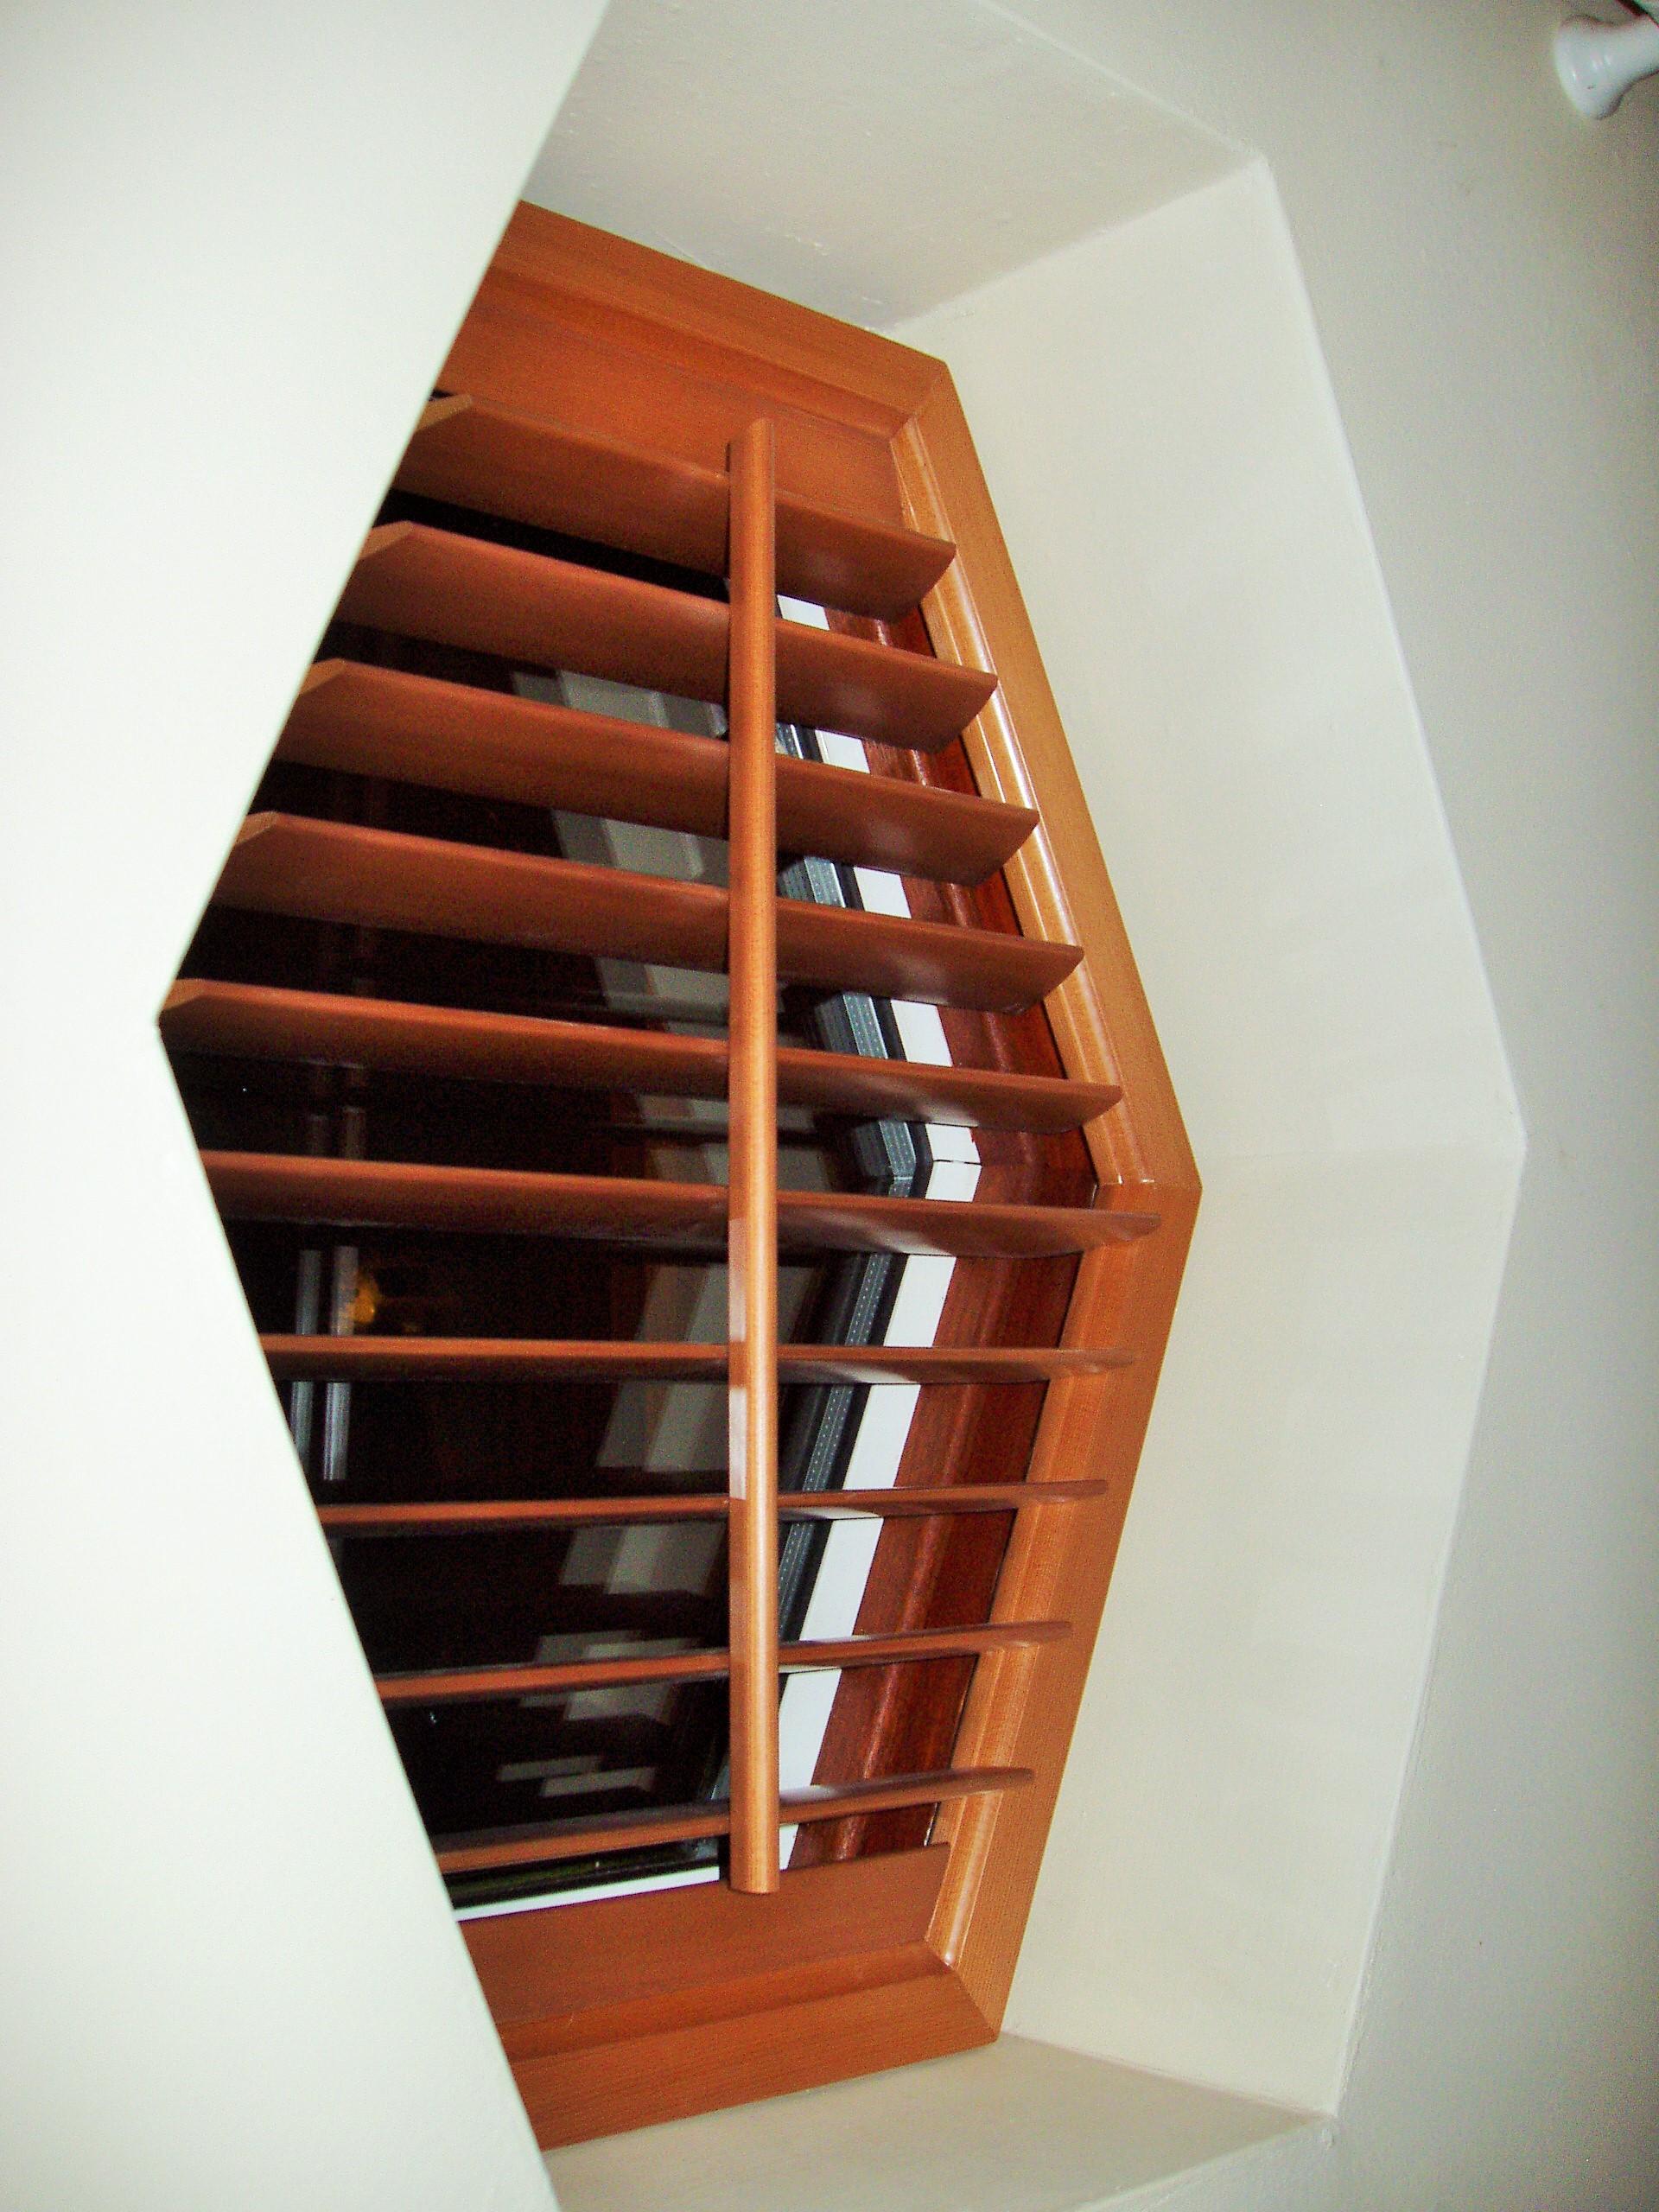 Wooden hexagonal shutter on special shape window